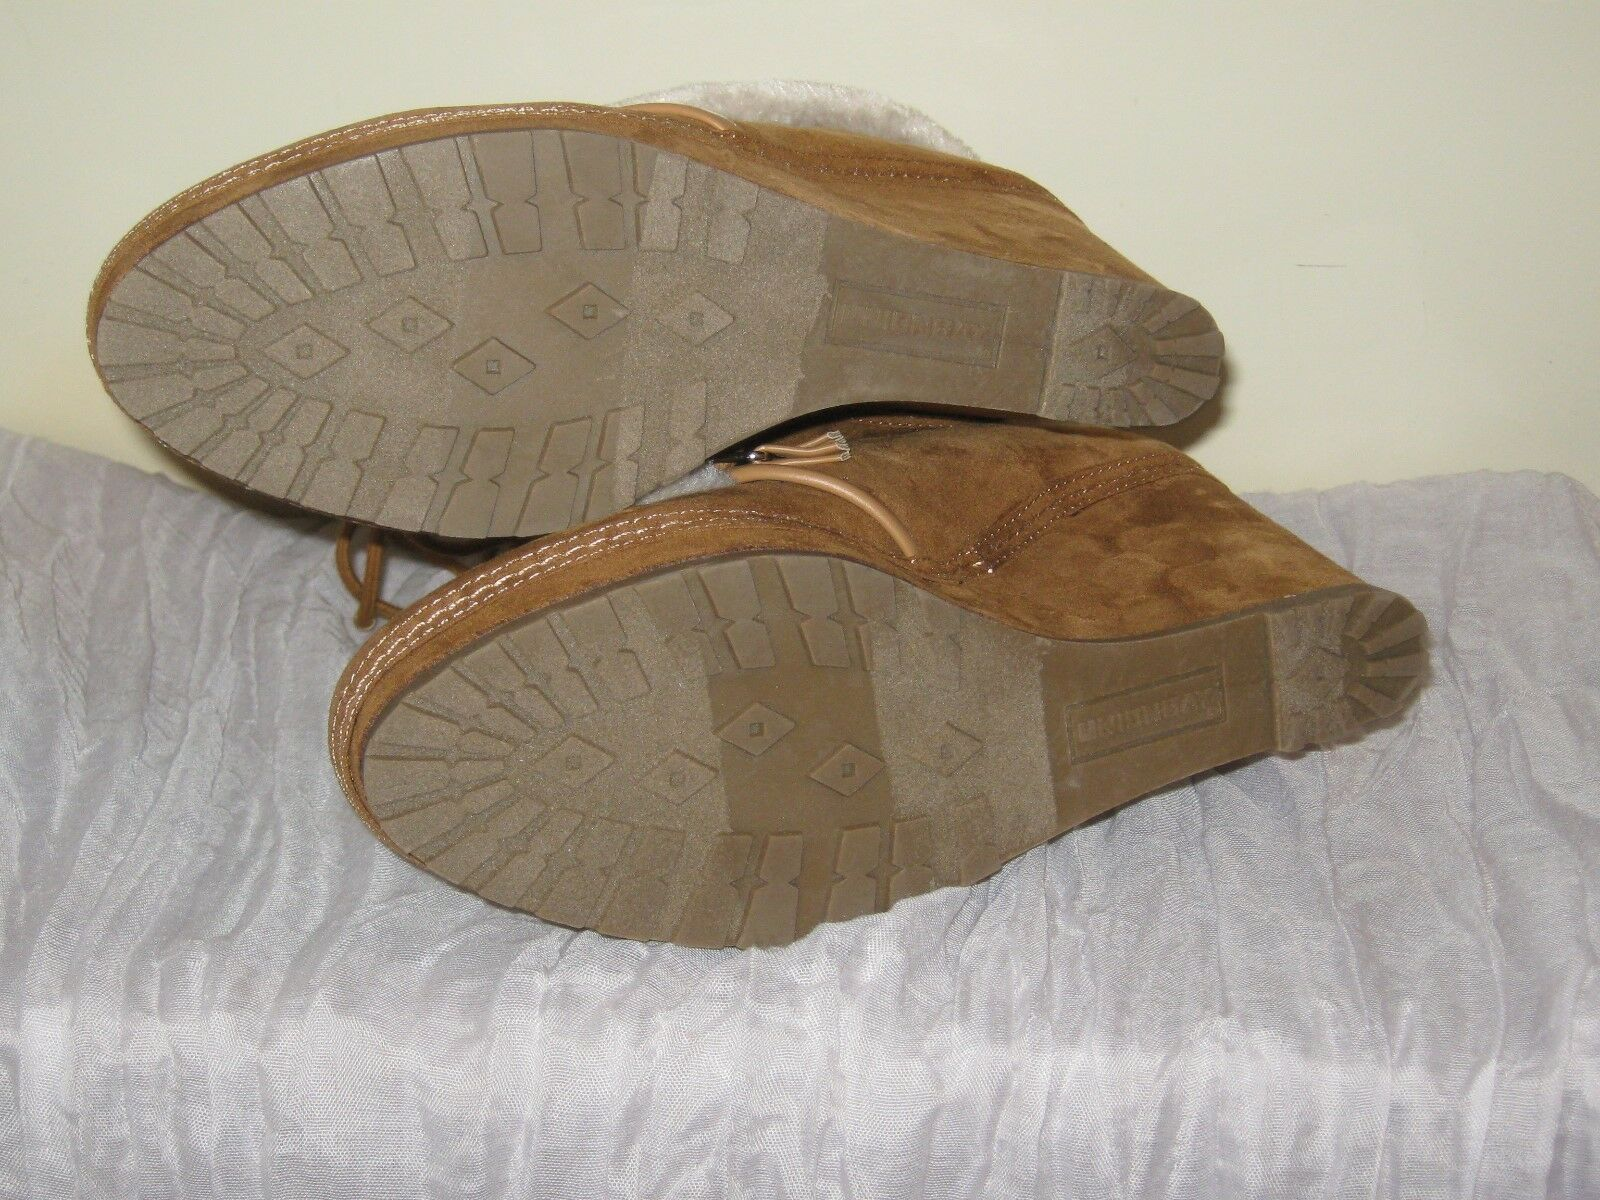 Unionbay Brown Boots Faux Fur Wedge #SH13 JR Size 8.5 NIB #SH13 Wedge f83e0f